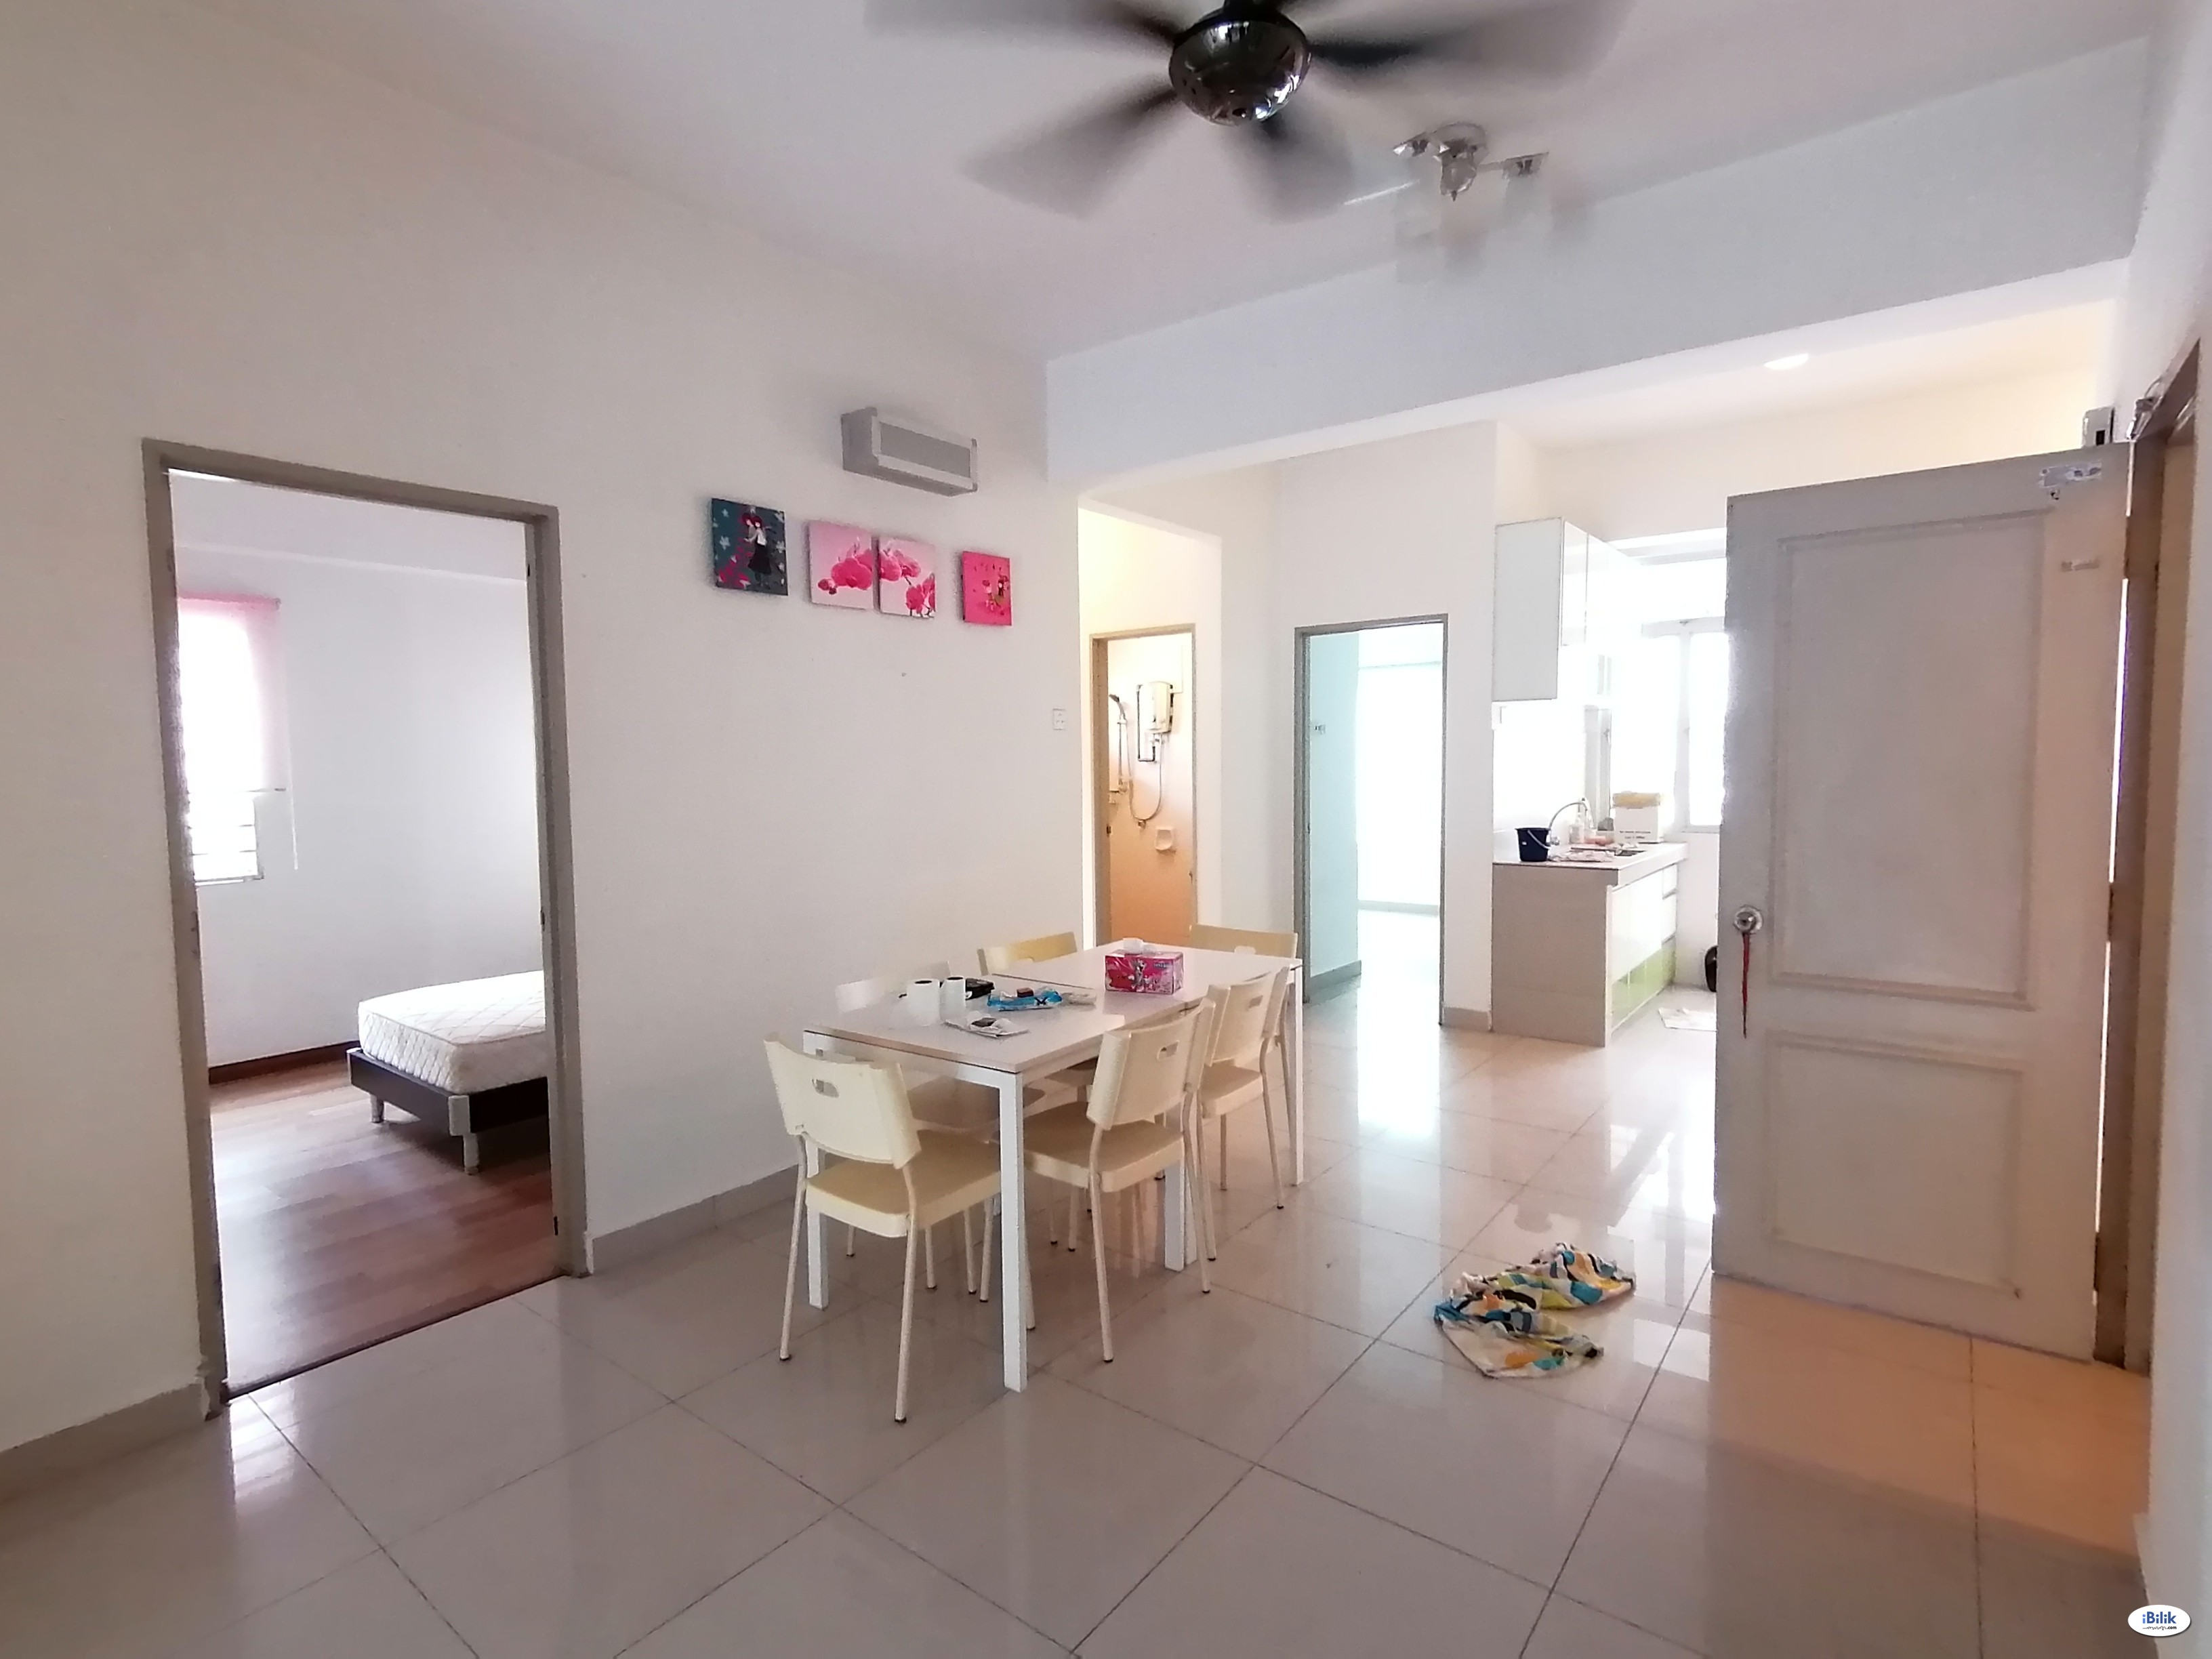 Middle Room at Taman Bukit Serdang, Seri Kembangan